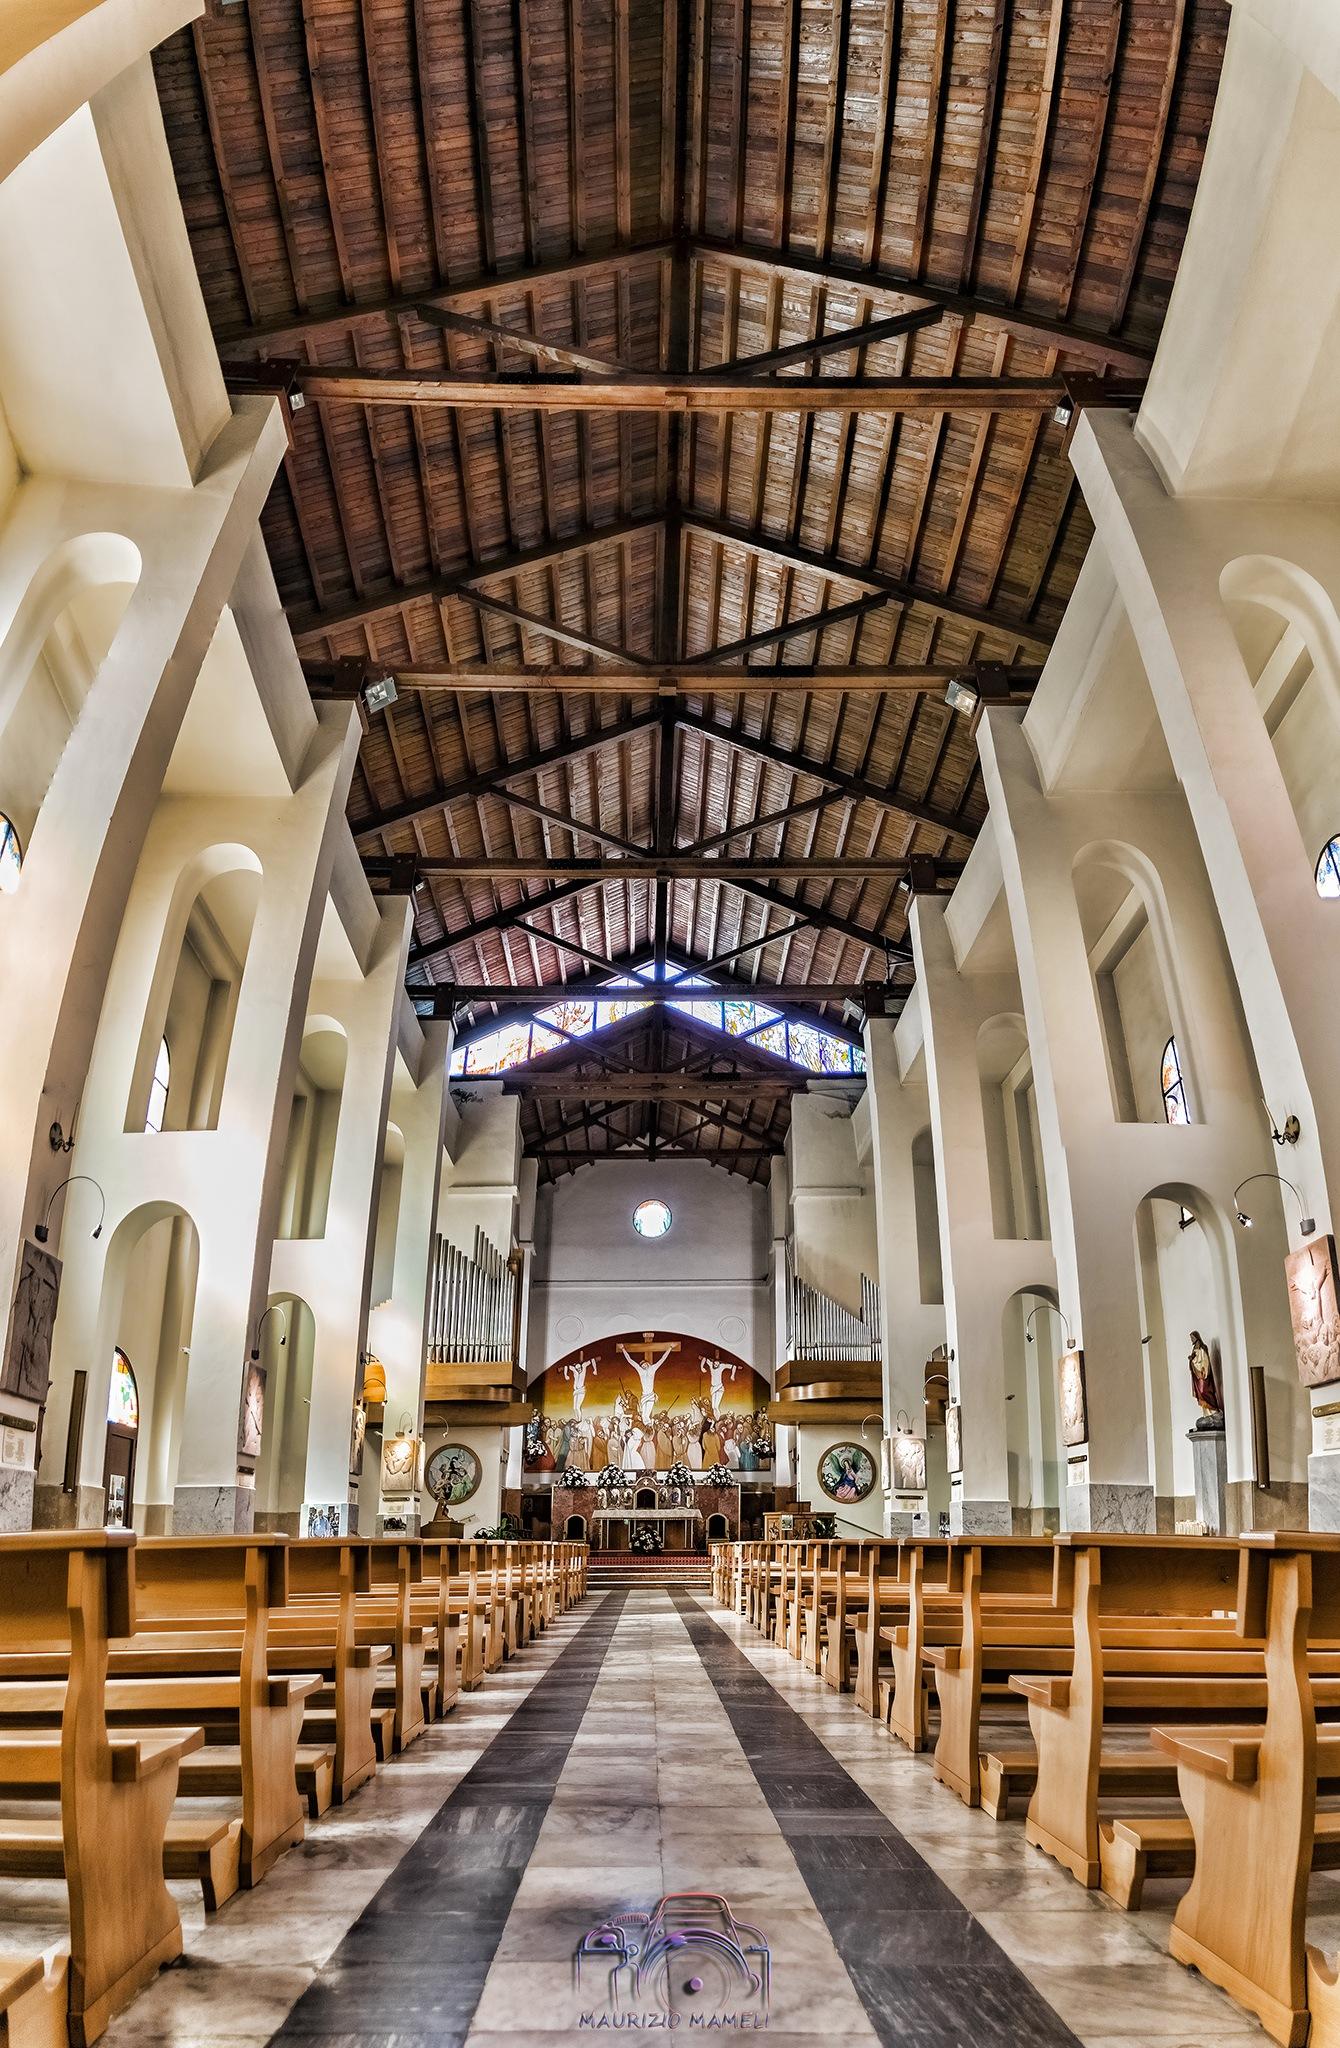 Church by Maurizio Mameli